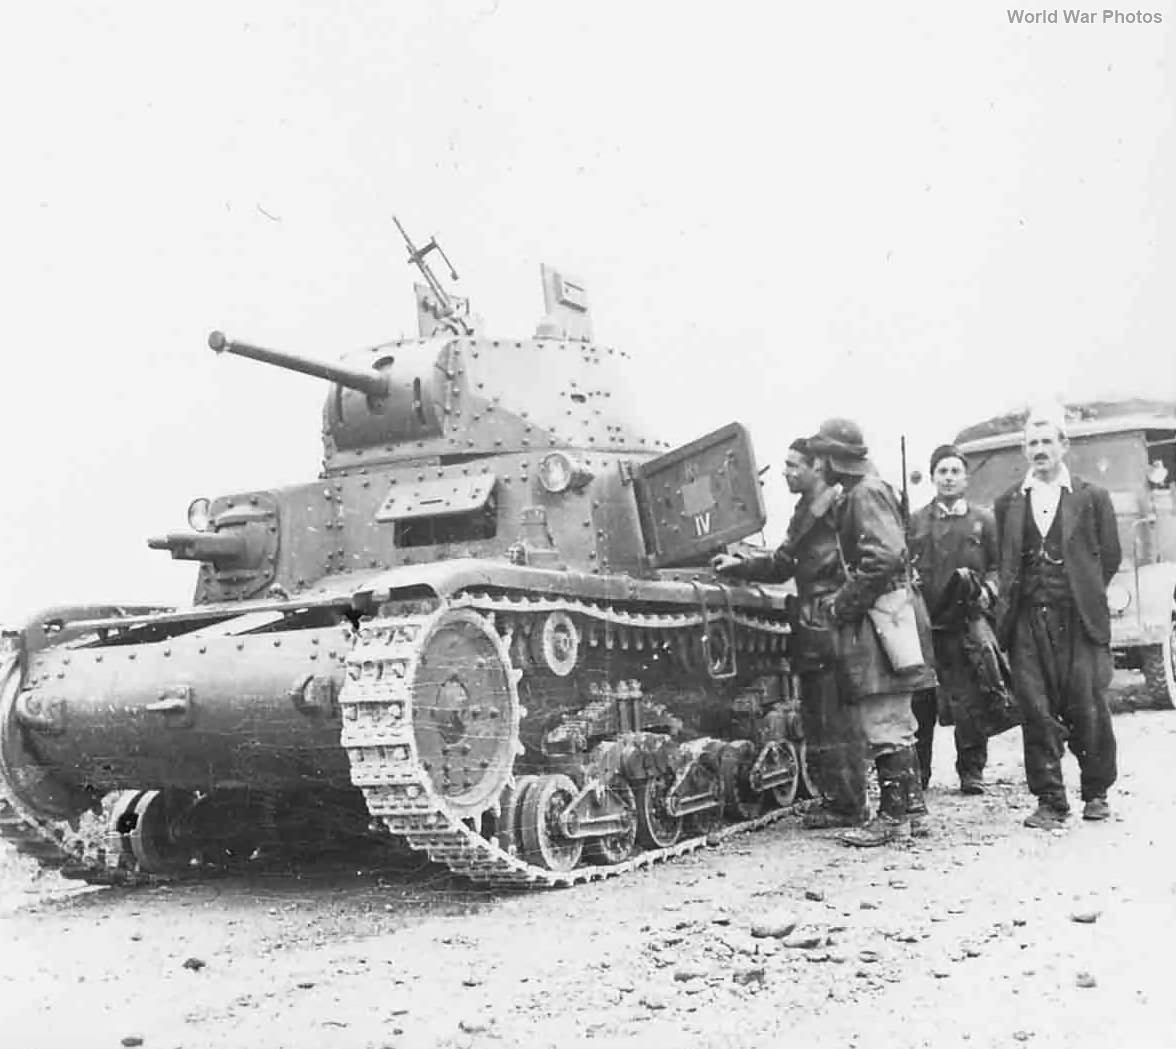 M13/40 of the IV Battaglione carri 2